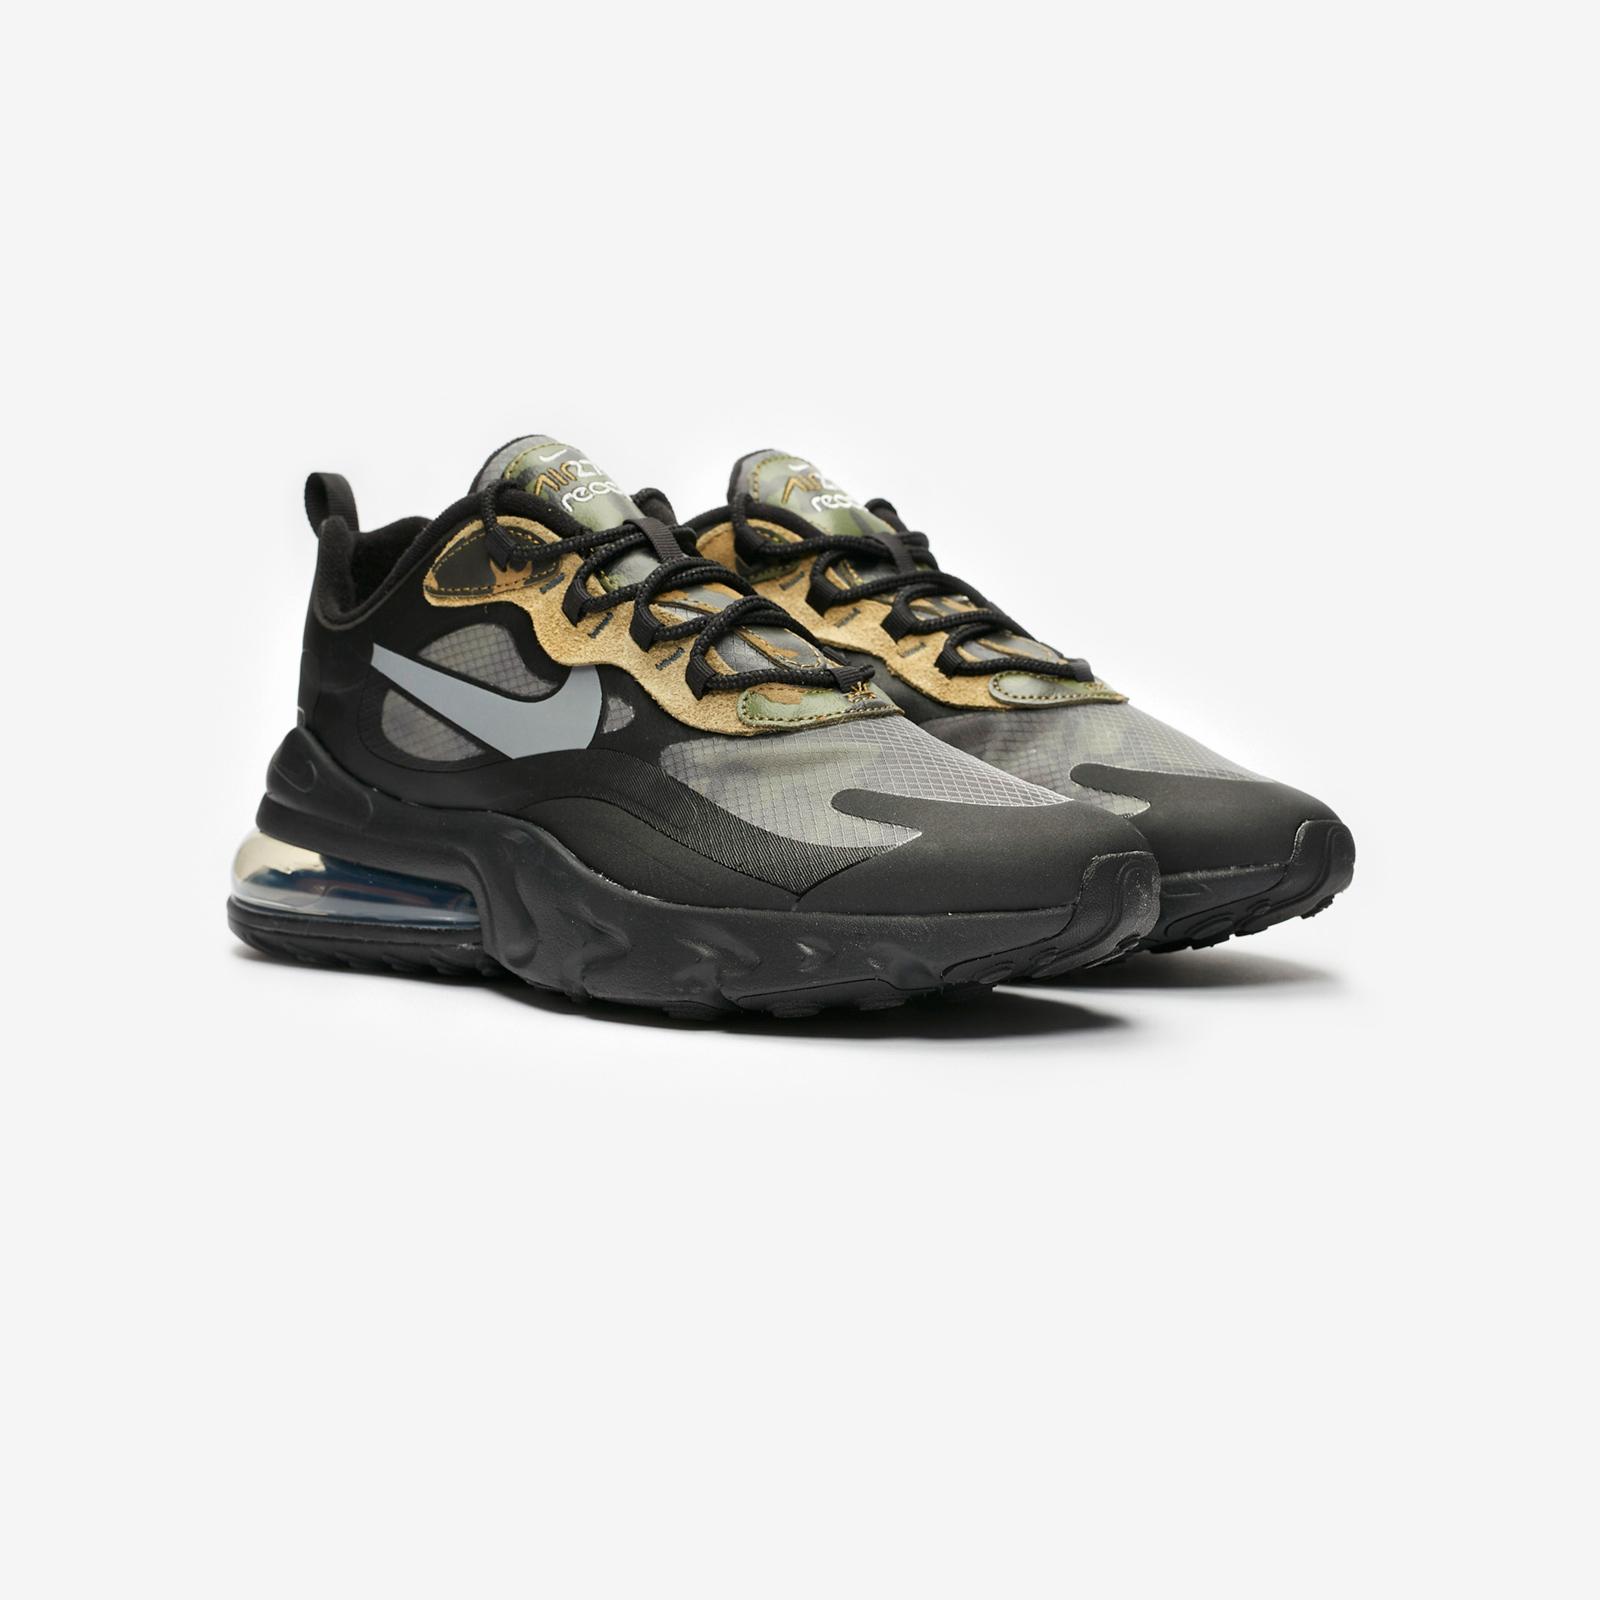 Nike Air Max 270 React CT5528 001